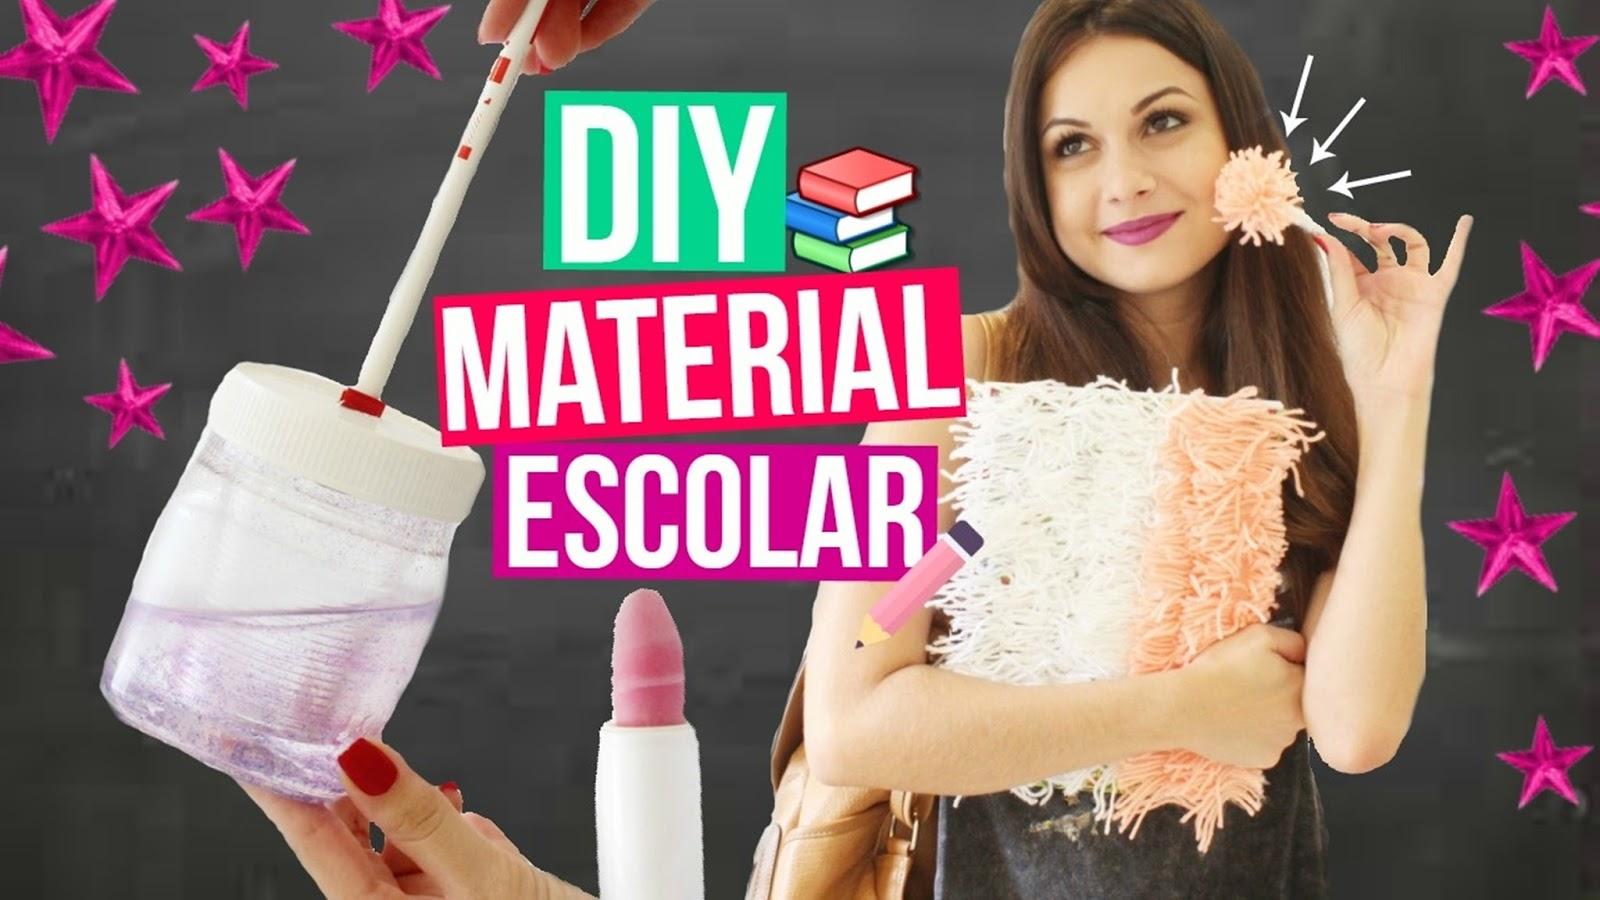 4 DIY MATERIAL ESCOLAR